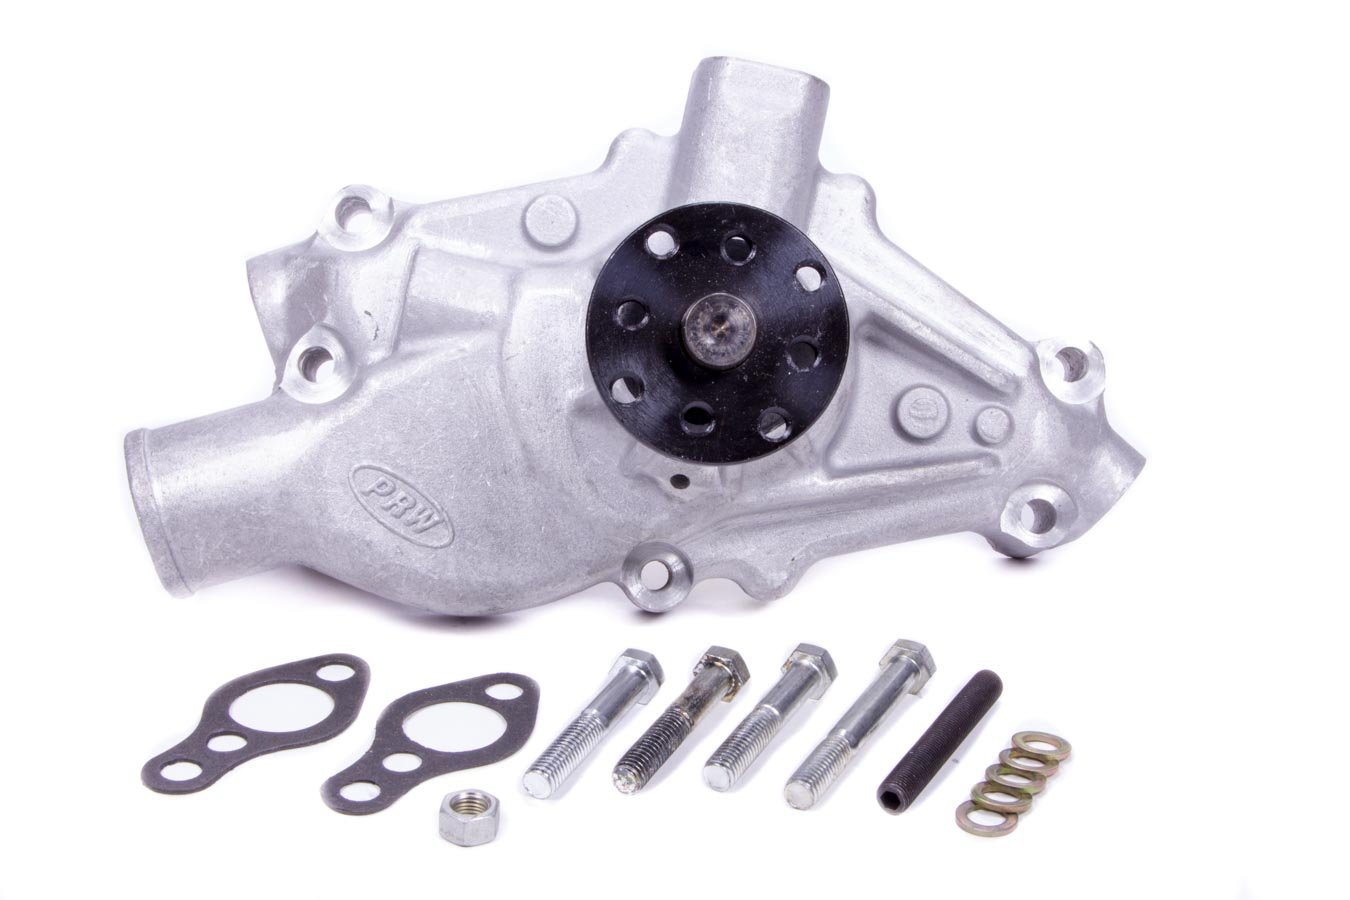 PRW 1435002 Performance Quotient 3//4 Pilot shaft Competition Plus Revised Impeller Entry Aluminum Water Pump for Chevy SB 1955-95